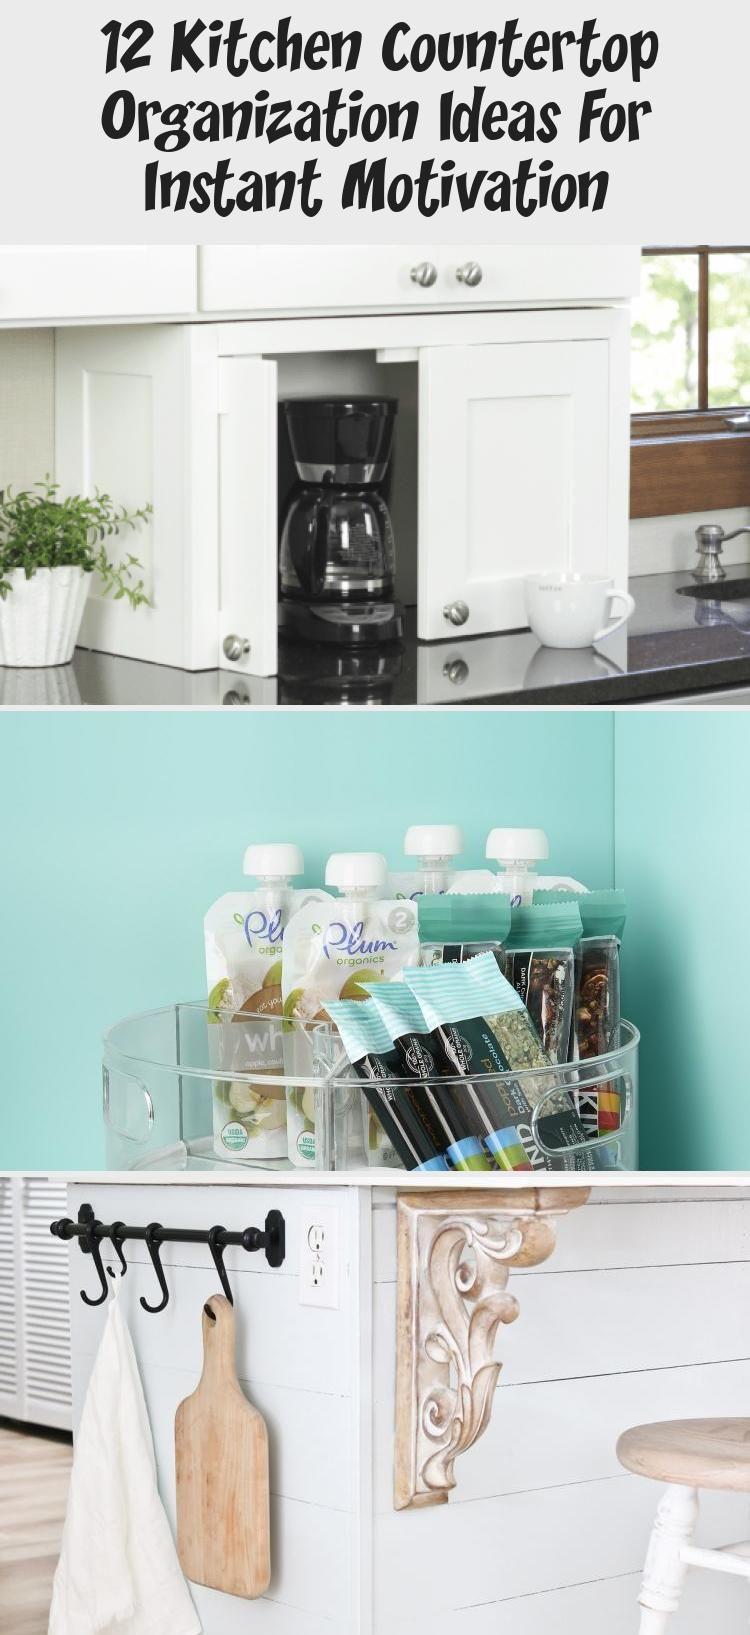 12 Kitchen Countertop Organization Ideas For Instant Motivation